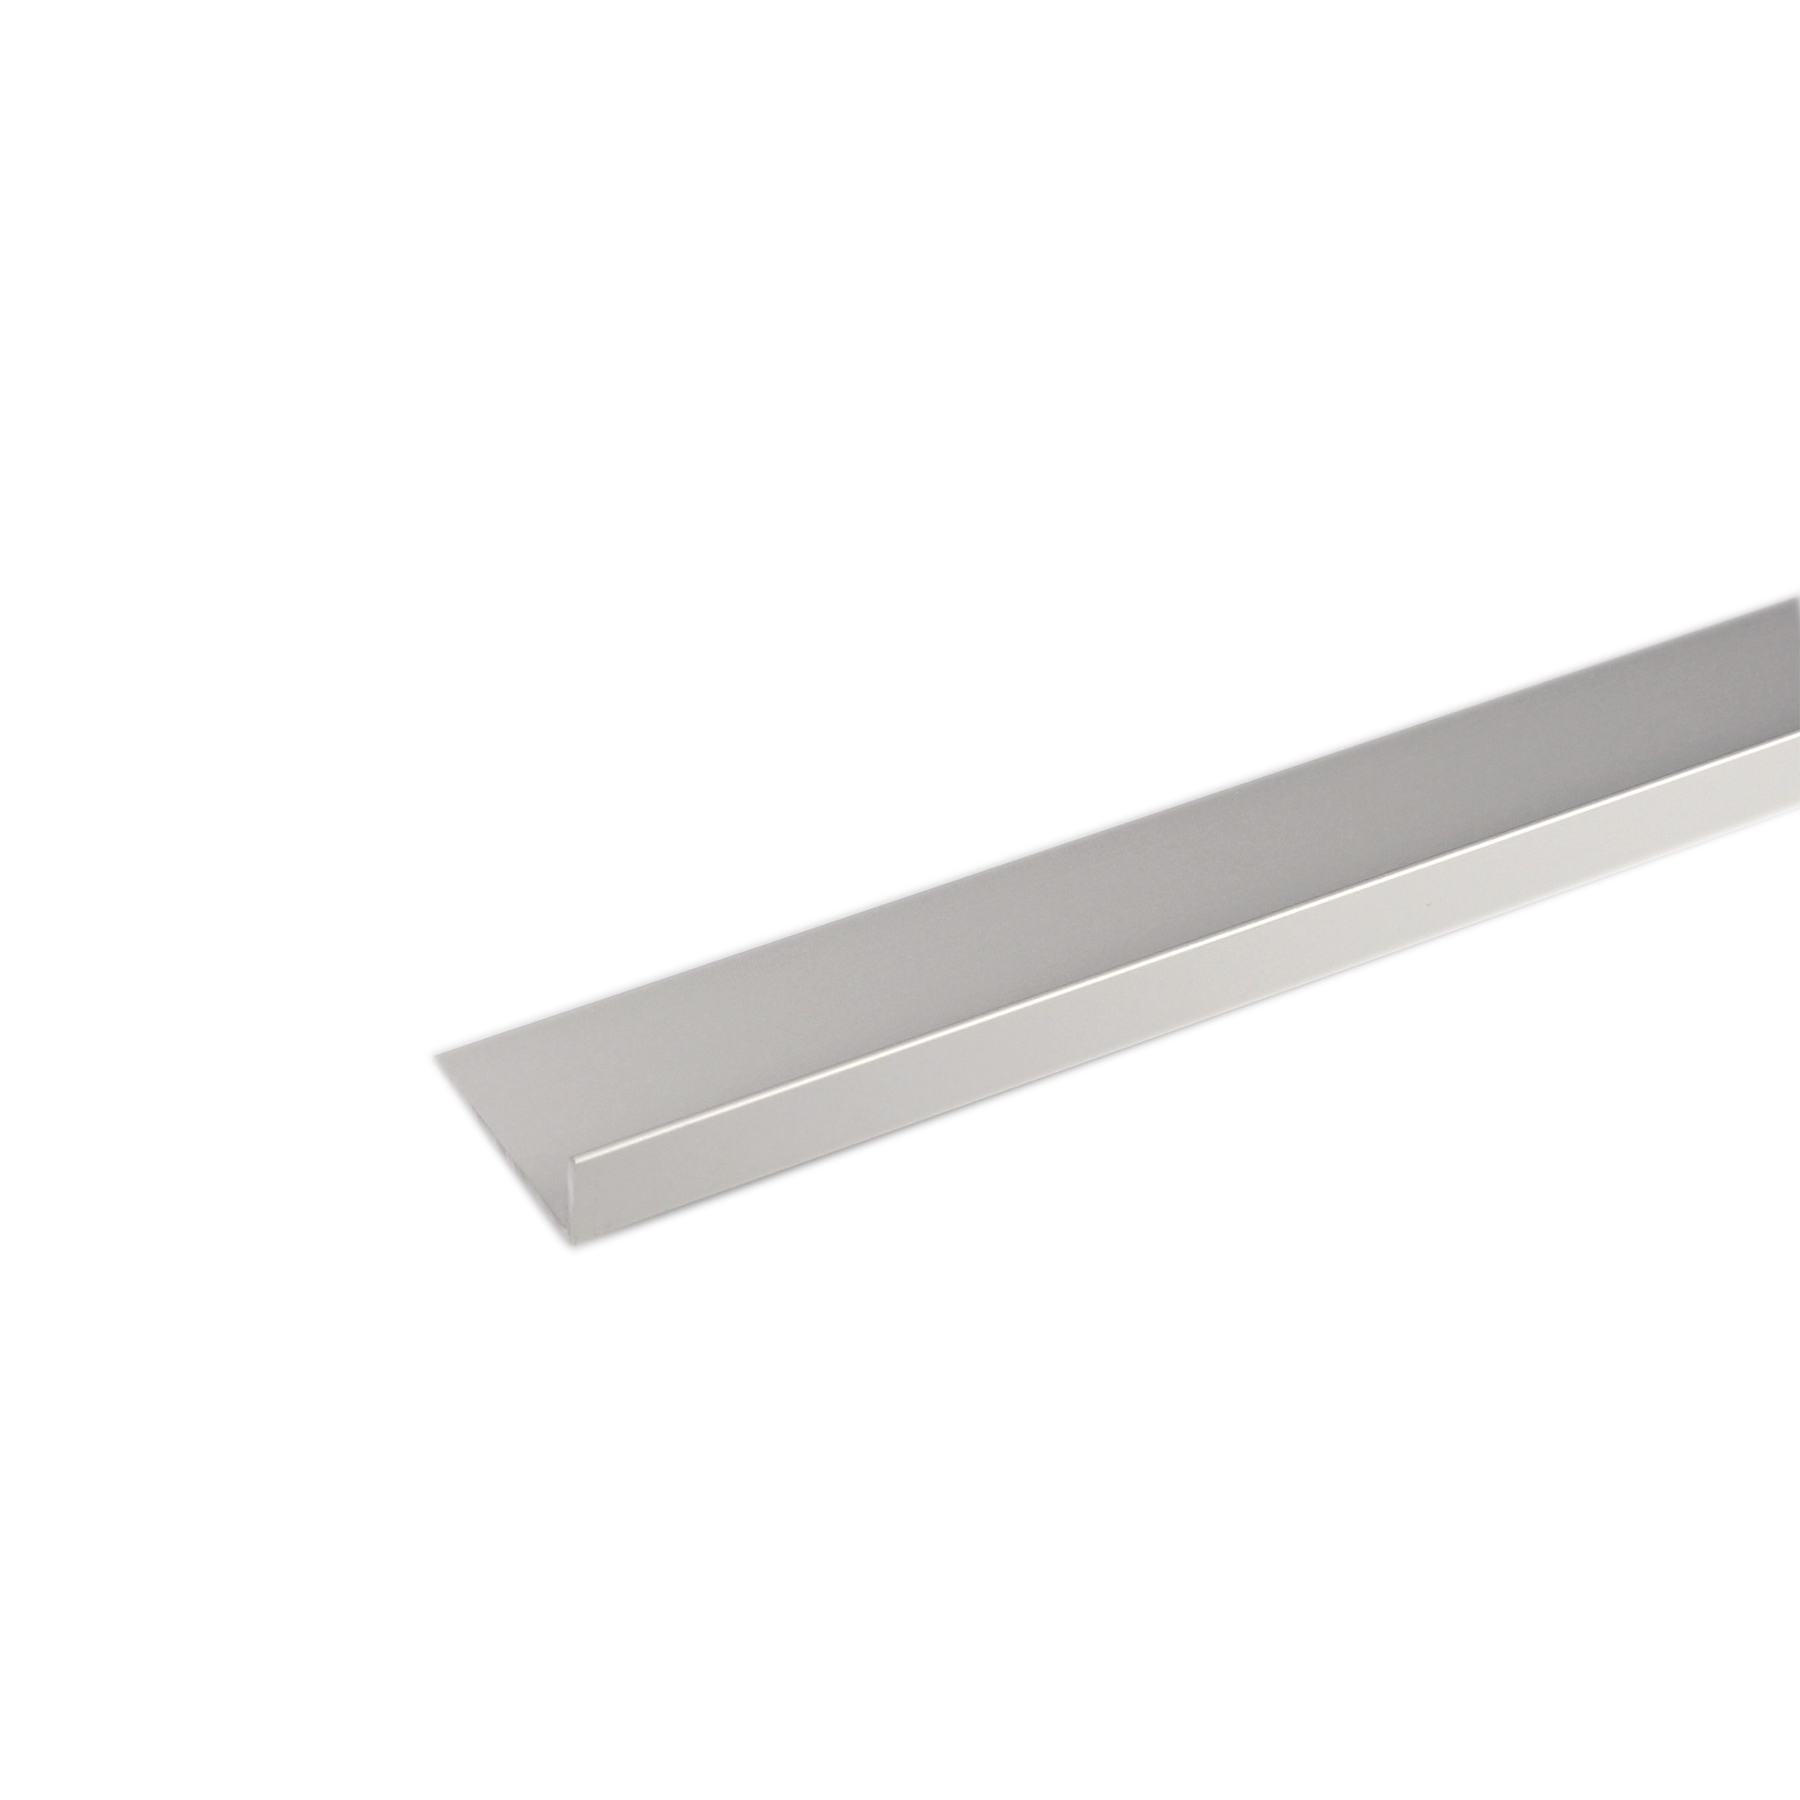 Perfil alum nio l 2mx20x10mm anodizado leroy merlin for Perfil u aluminio leroy merlin